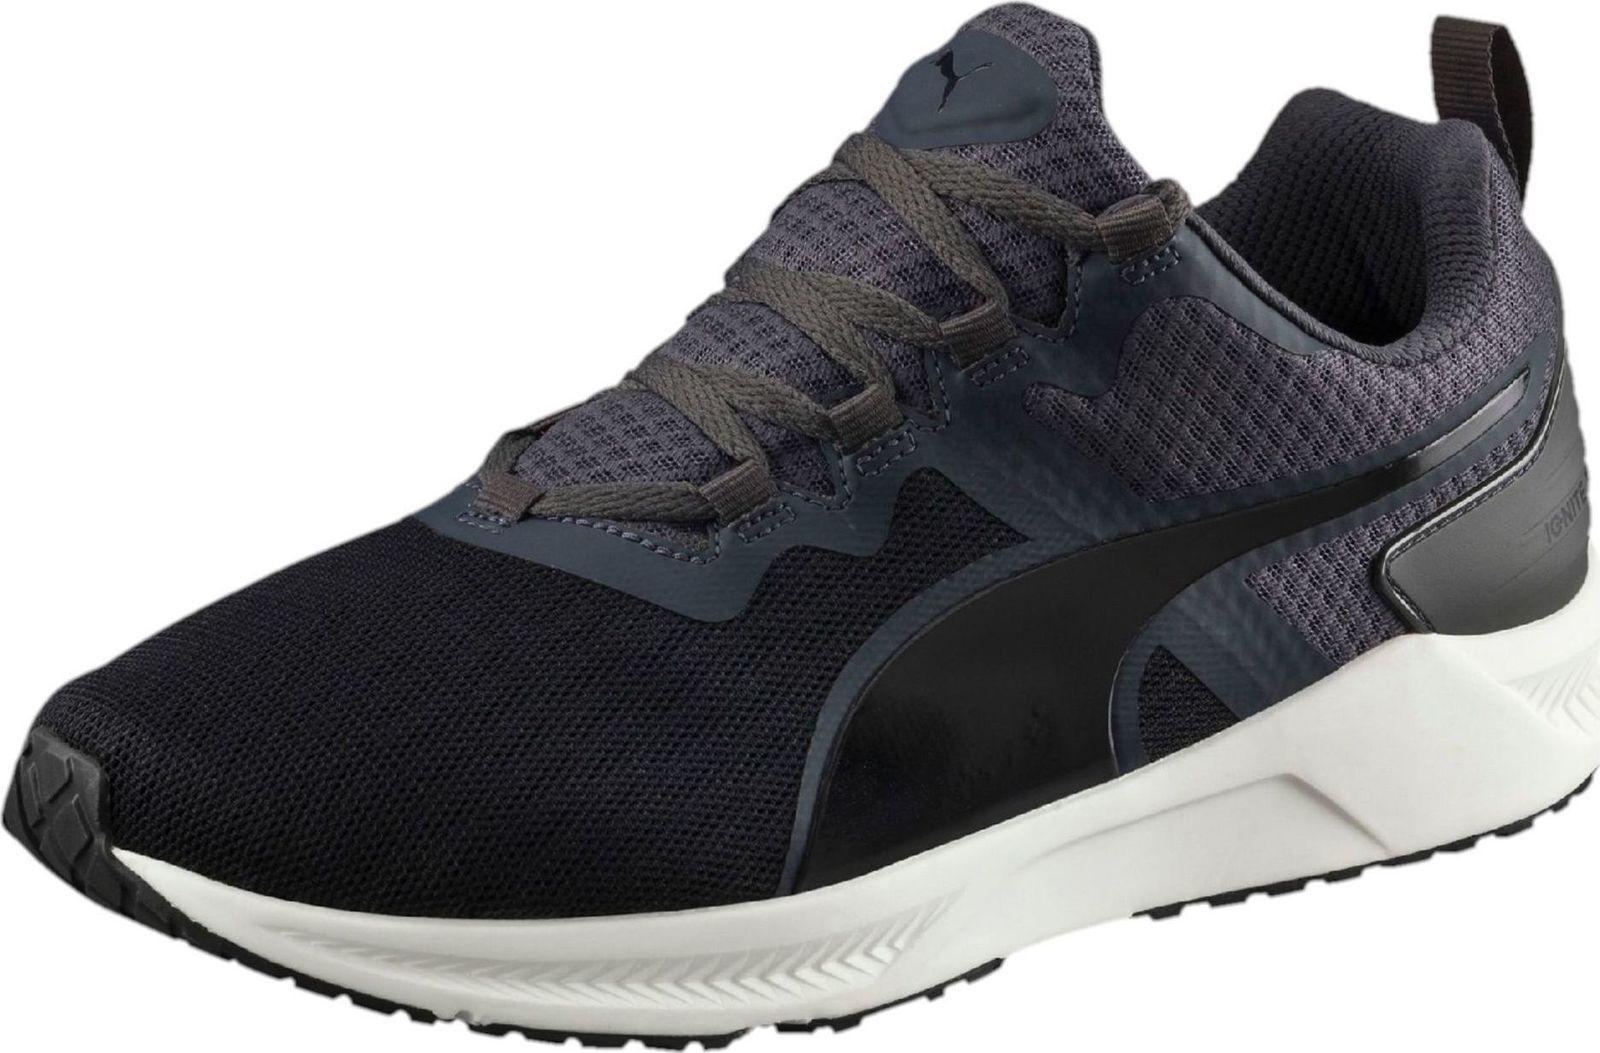 Puma corriendo Ignite XT Vhombres' s corriendo Puma zapatos 188997 03 tamaño 10,5 retail price reduction 5c0c1c